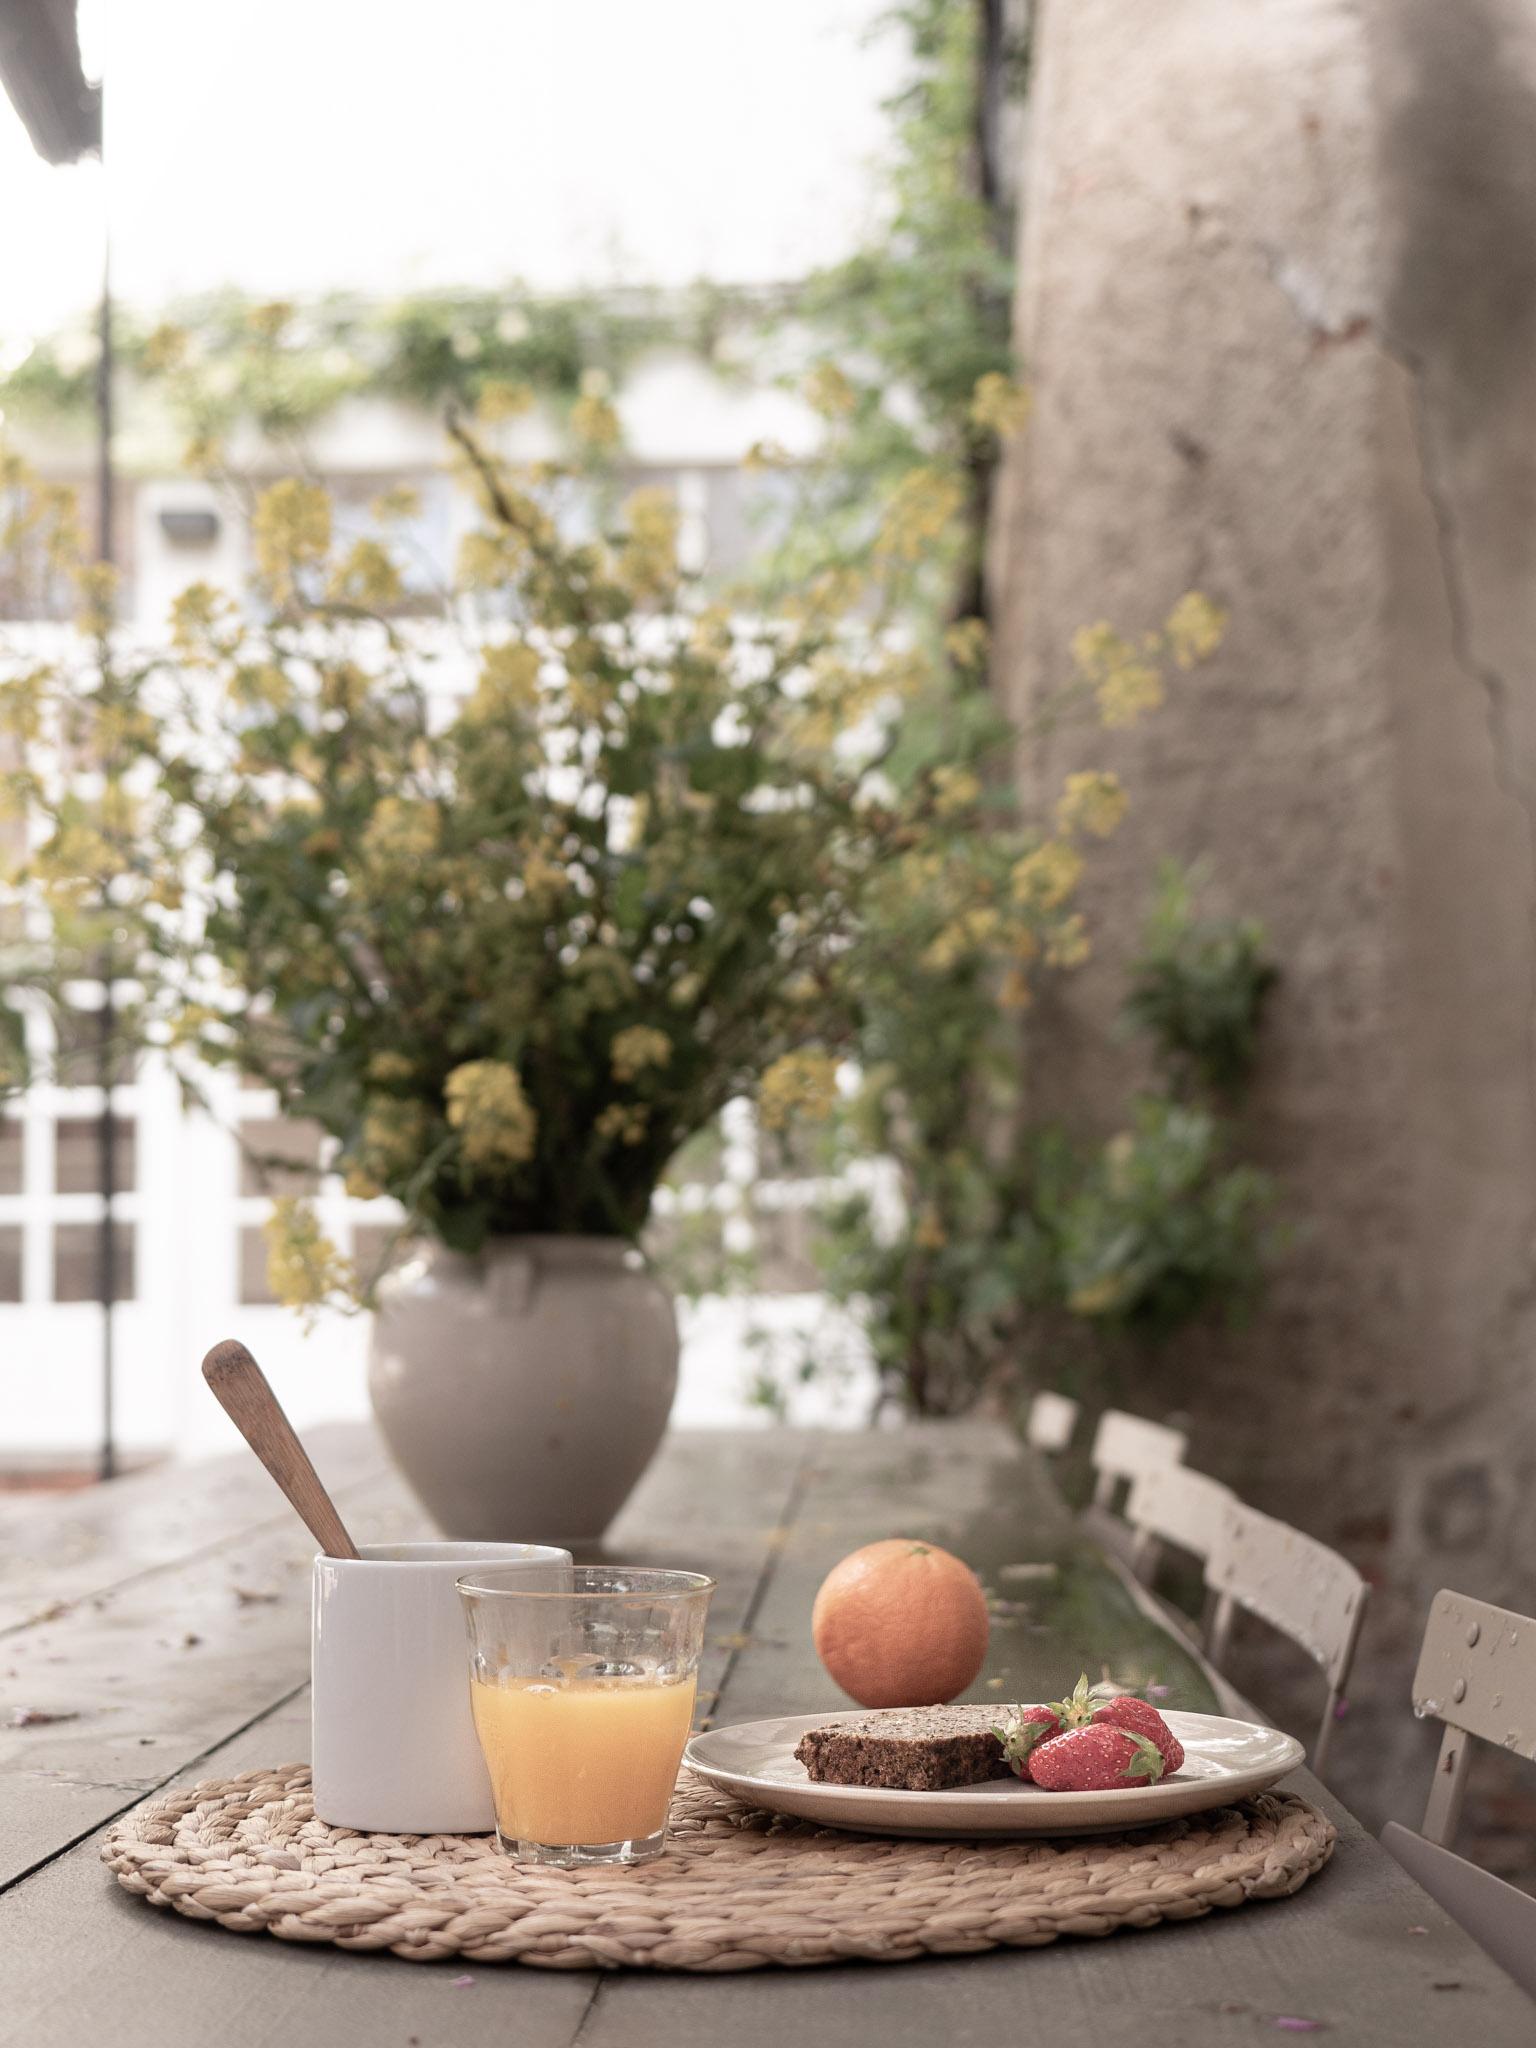 camellas-lloret-bed-and-breakfast.jpg